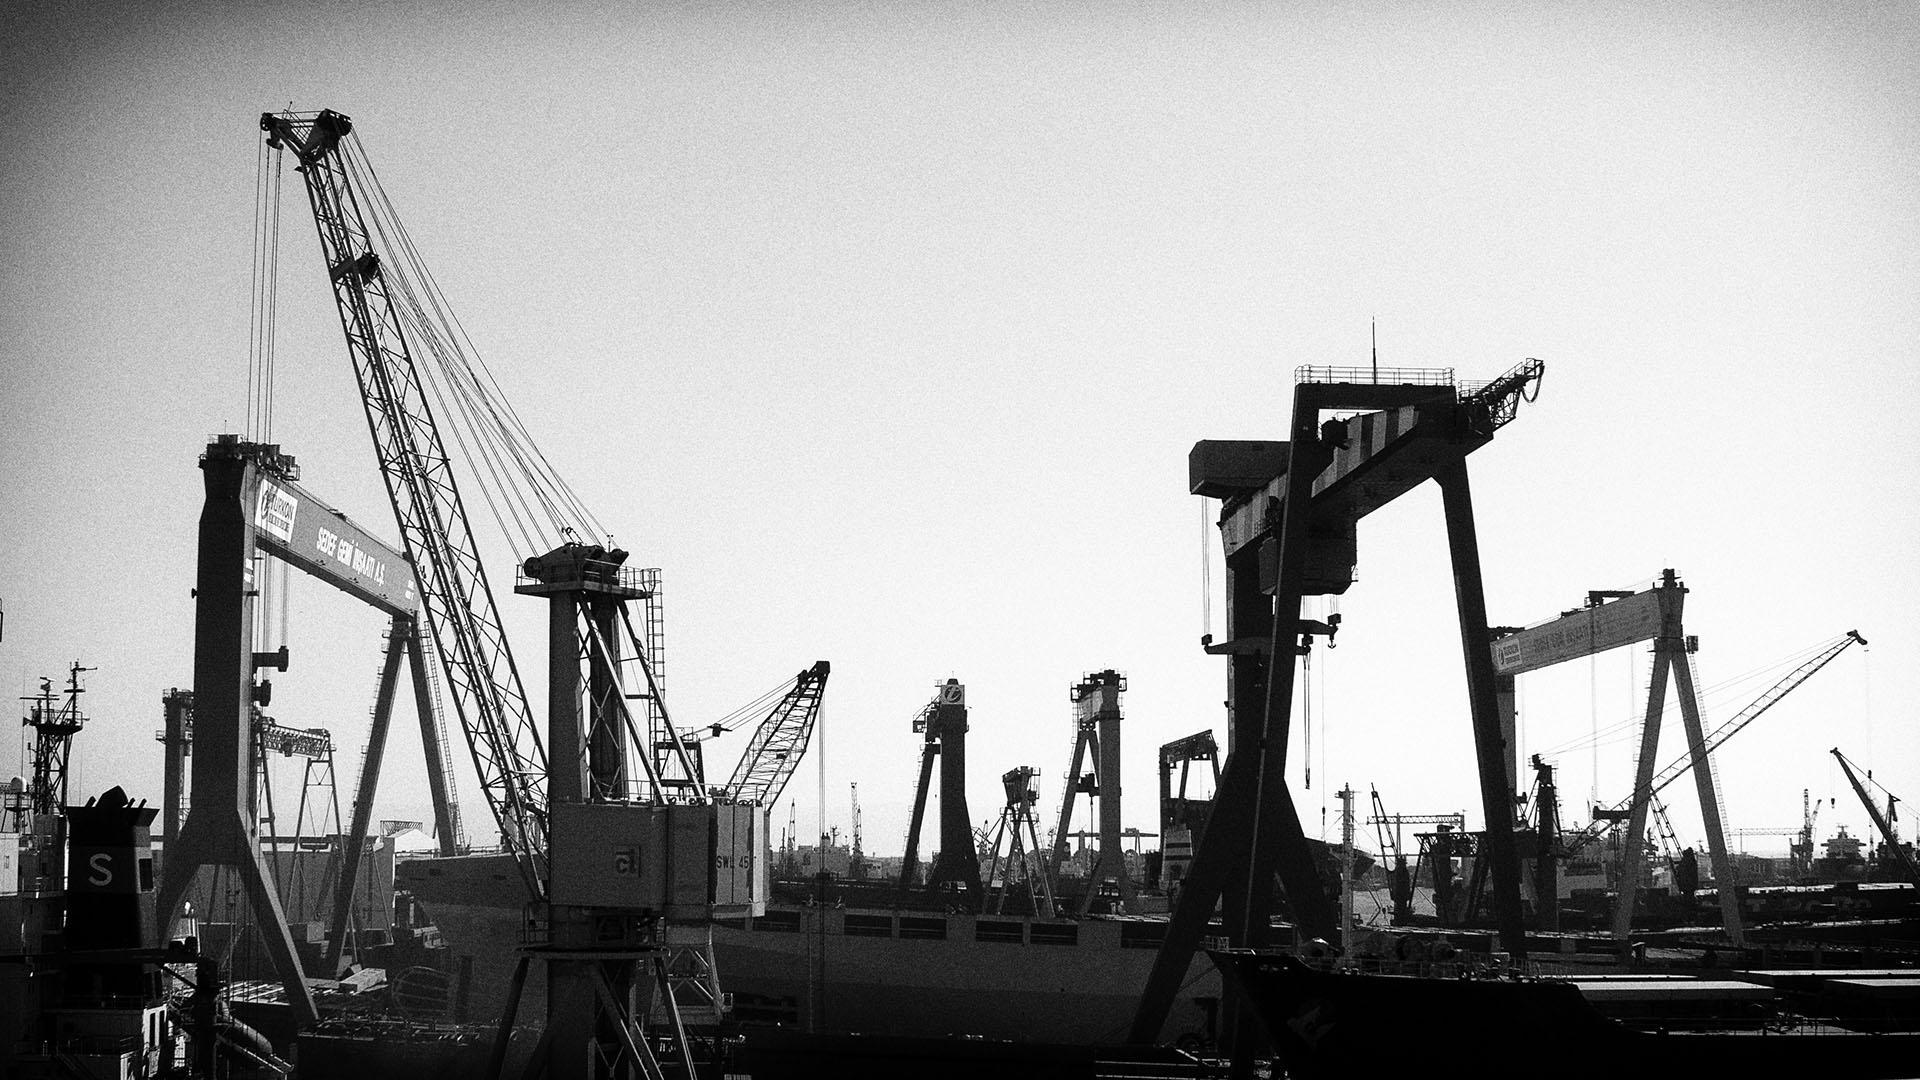 Shipping, Ship Finance, Transportation & Aviation